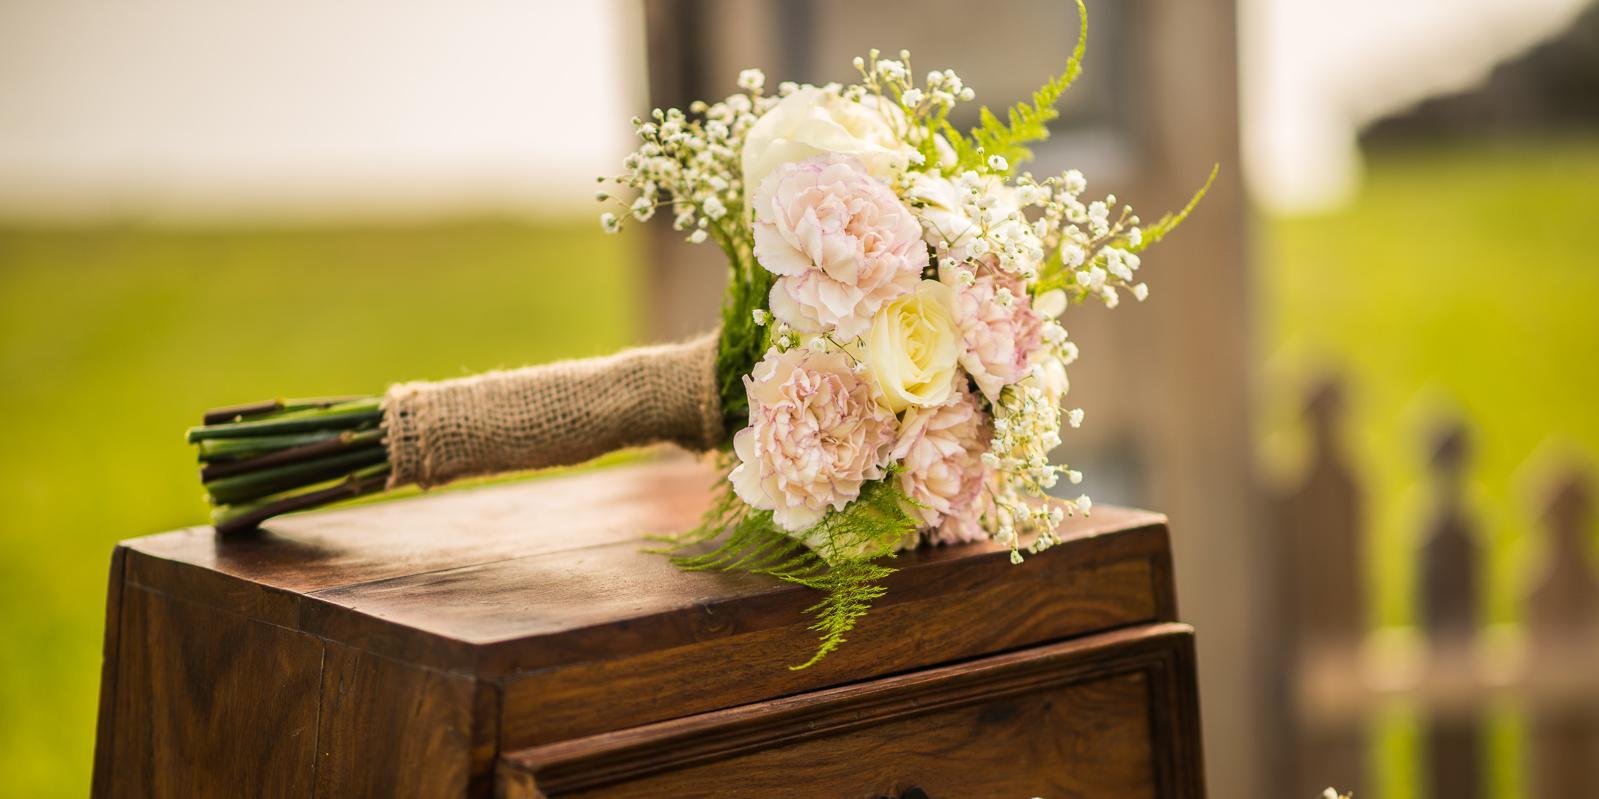 bodas-estilo-libre-jardin-cuba-8821.jpg